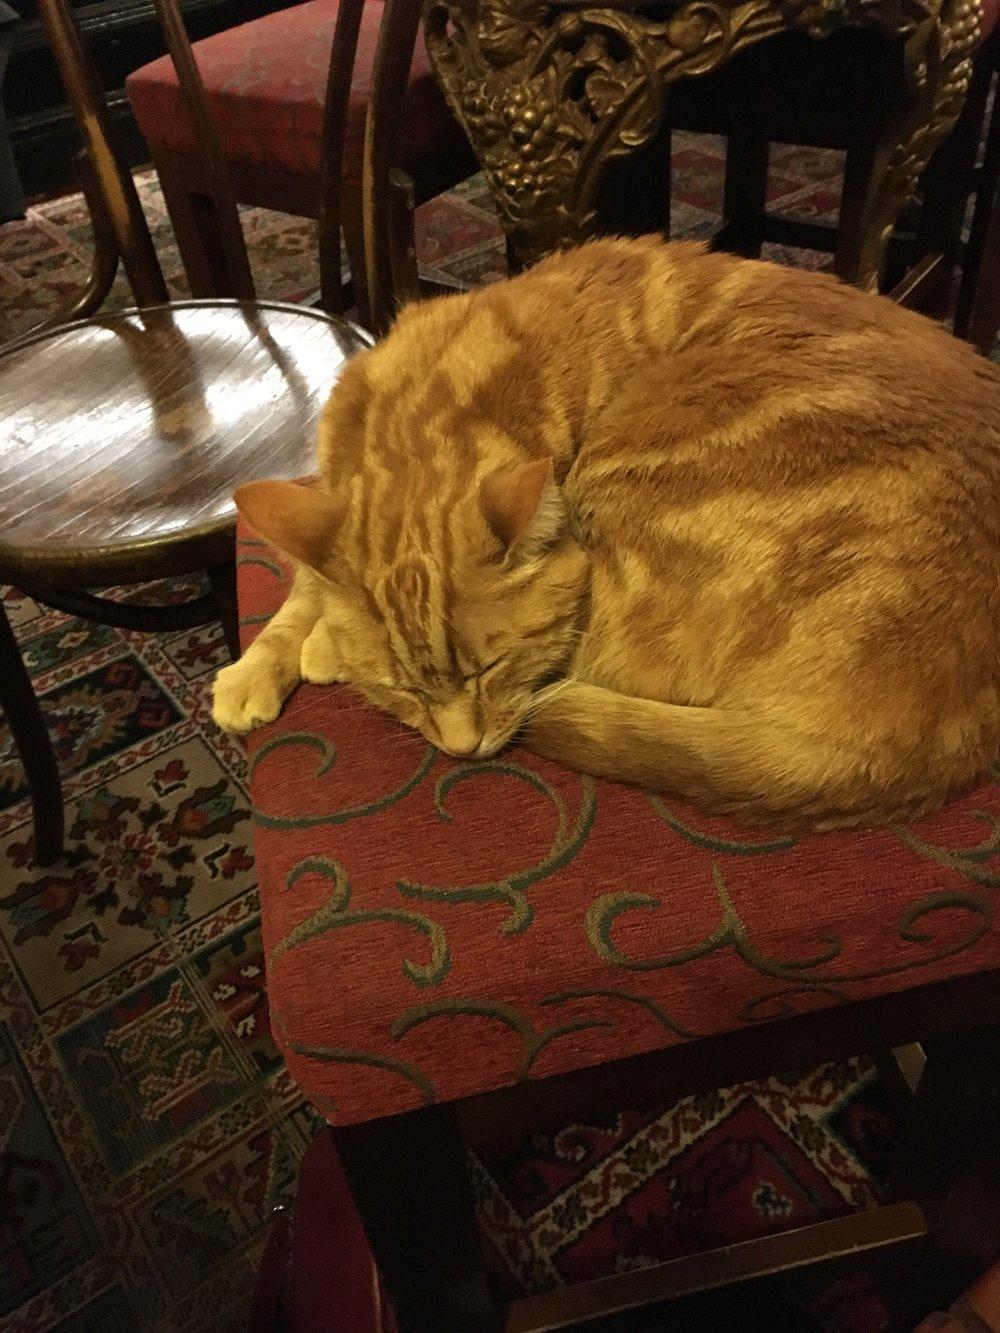 The Alex's pub cat Tommy